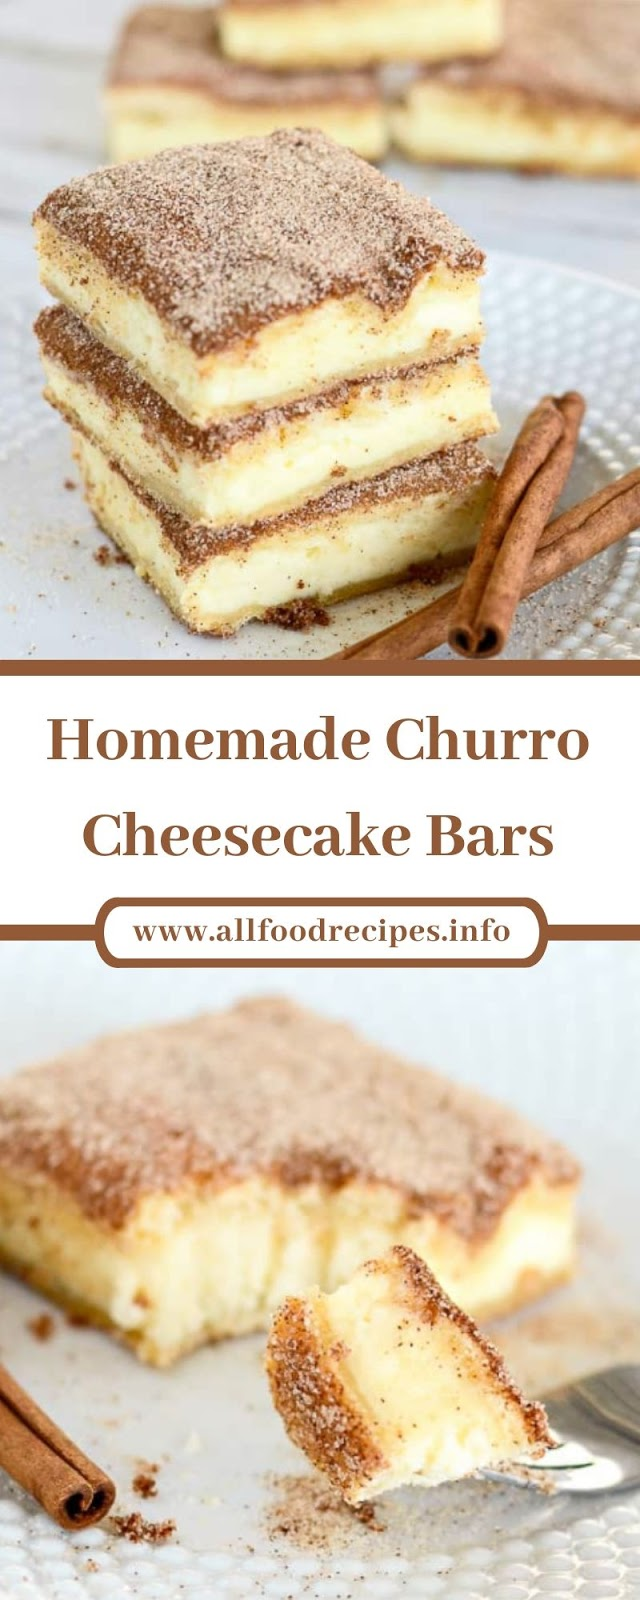 Homemade Churro Cheesecake Bars